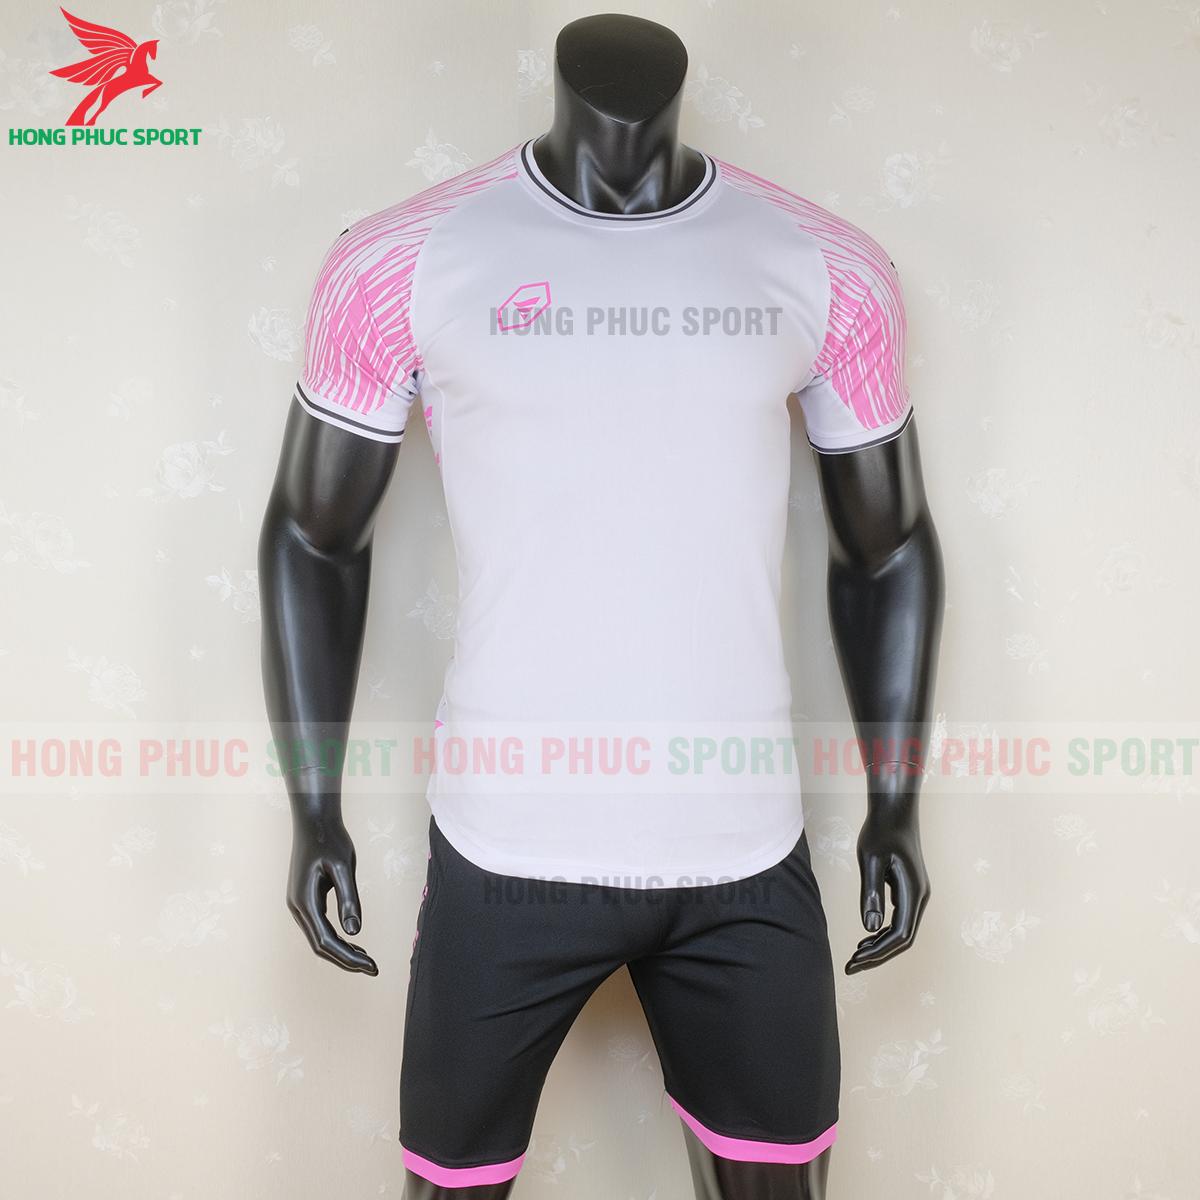 https://cdn.hongphucsport.com/unsafe/s4.shopbay.vn/files/285/ao-bong-da-khong-logo-ta-a06-mau-2-1-5f71c160e813d.png